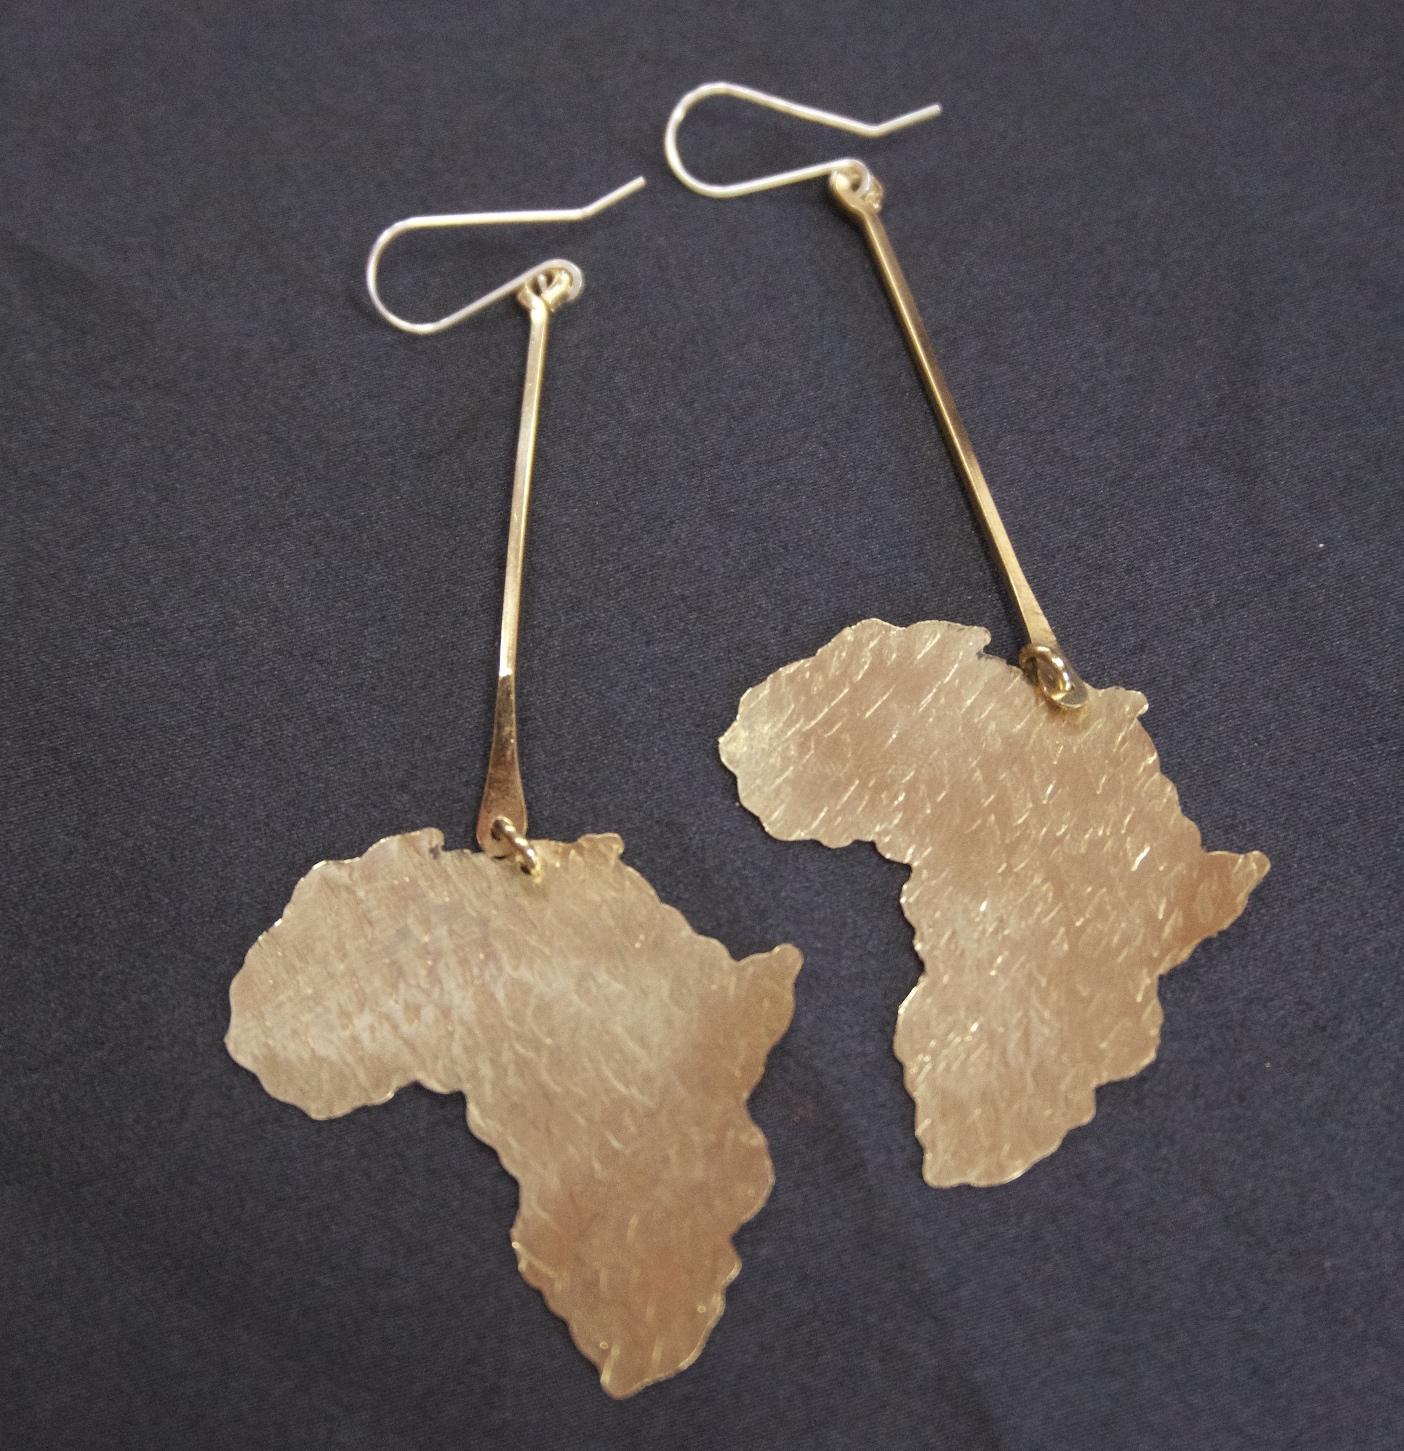 AfricaPieces24